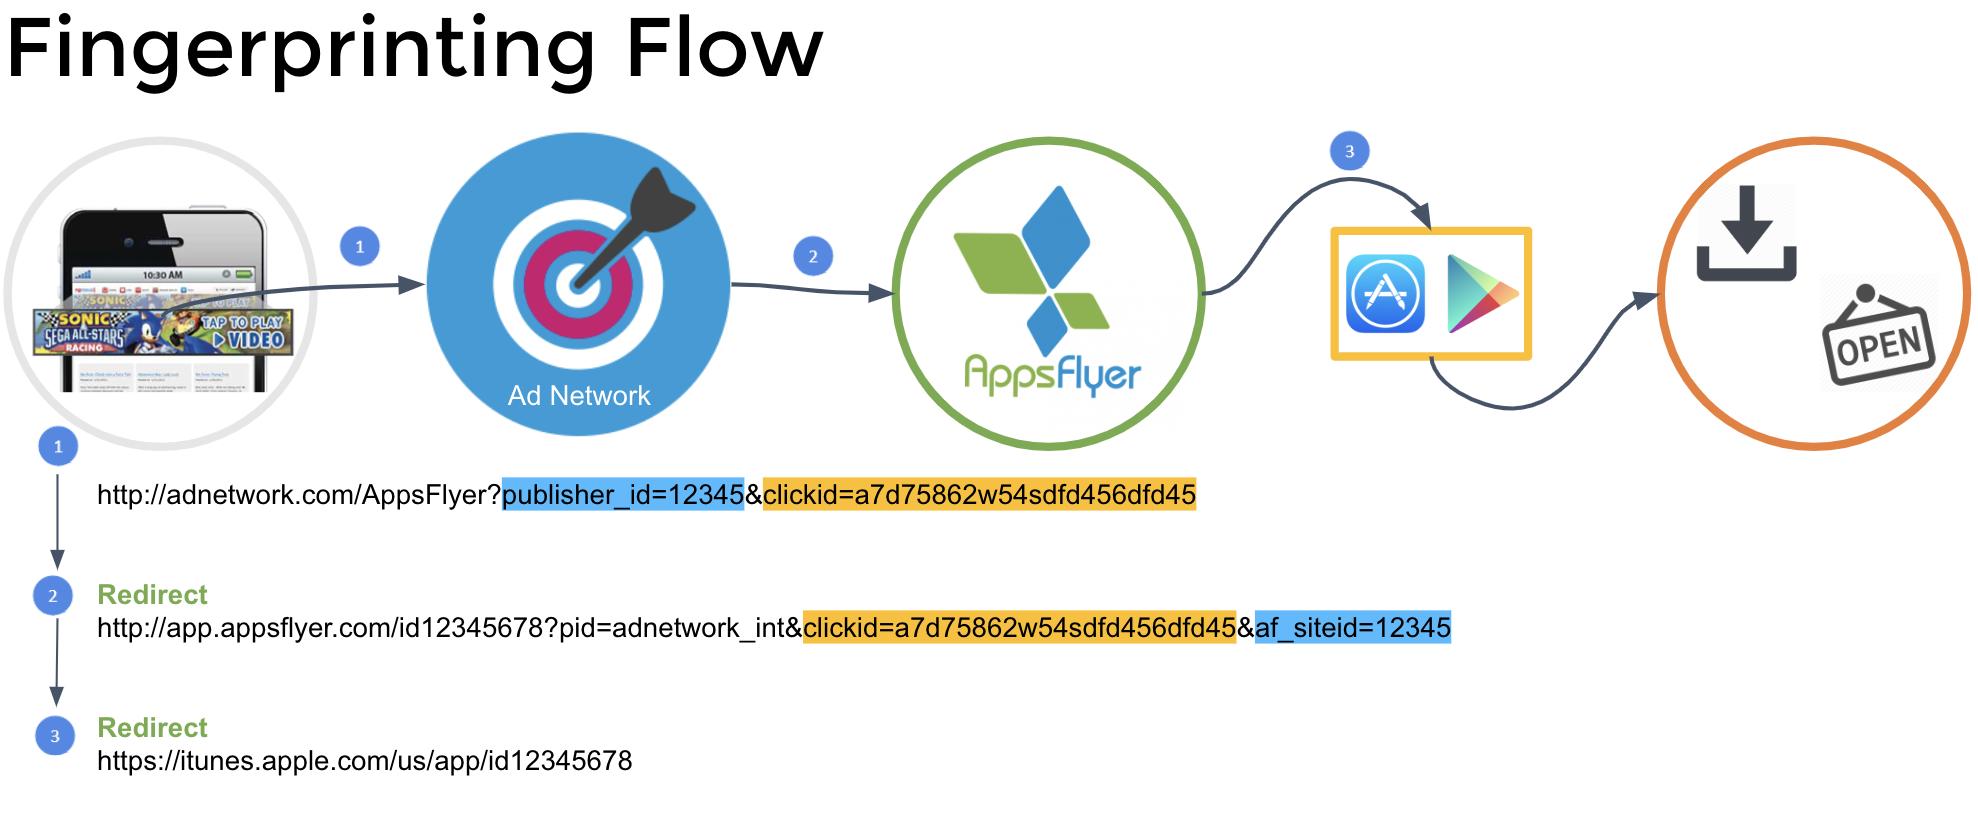 Attribution flow in AppsFlyer: Fingerprinting